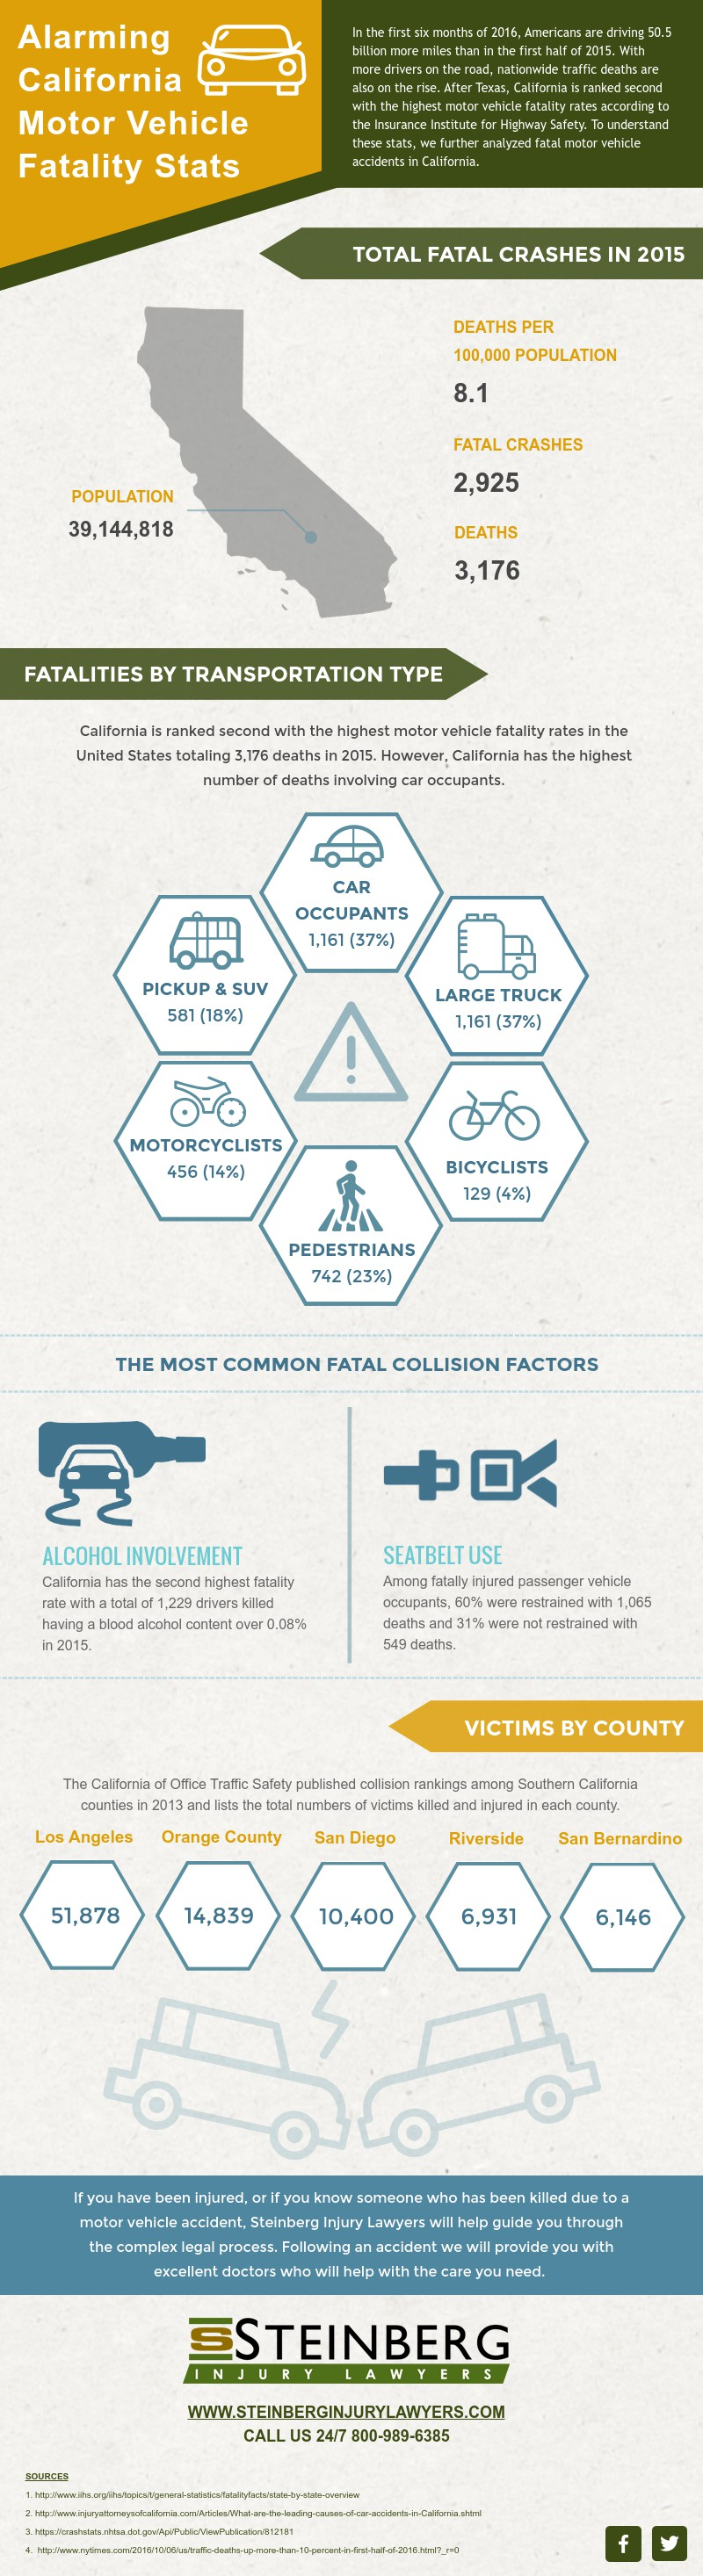 Alarming California Motor Vehicle Fatality Stats   Steinberg